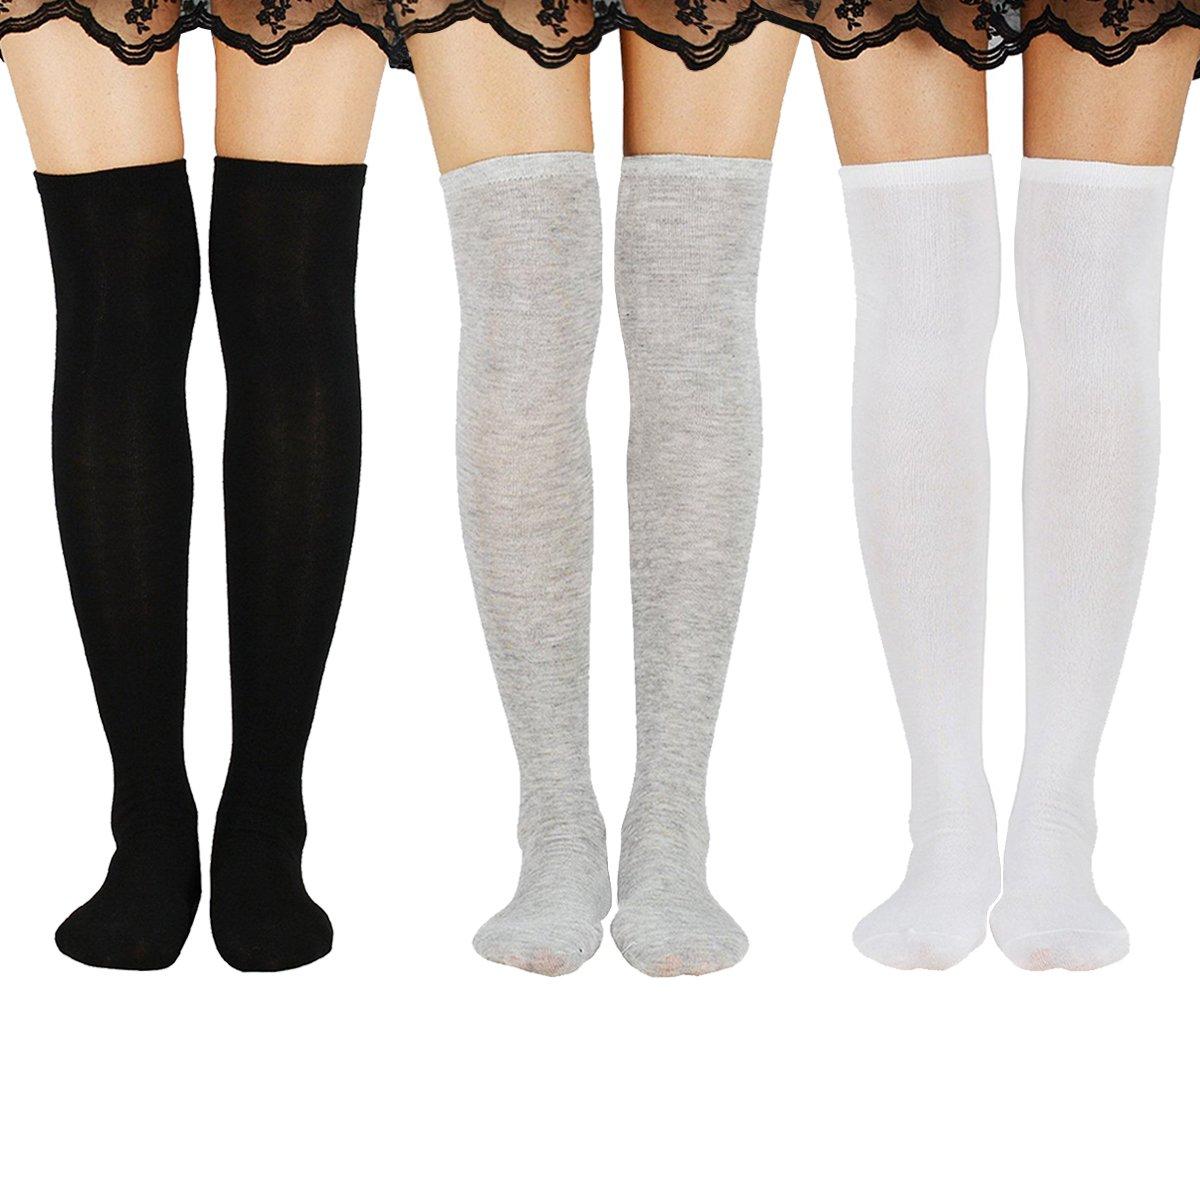 Zando Womens Casual Knee High Socks Thigh High Tube Stockings Sock 3 Pairs Black White Grey One Size